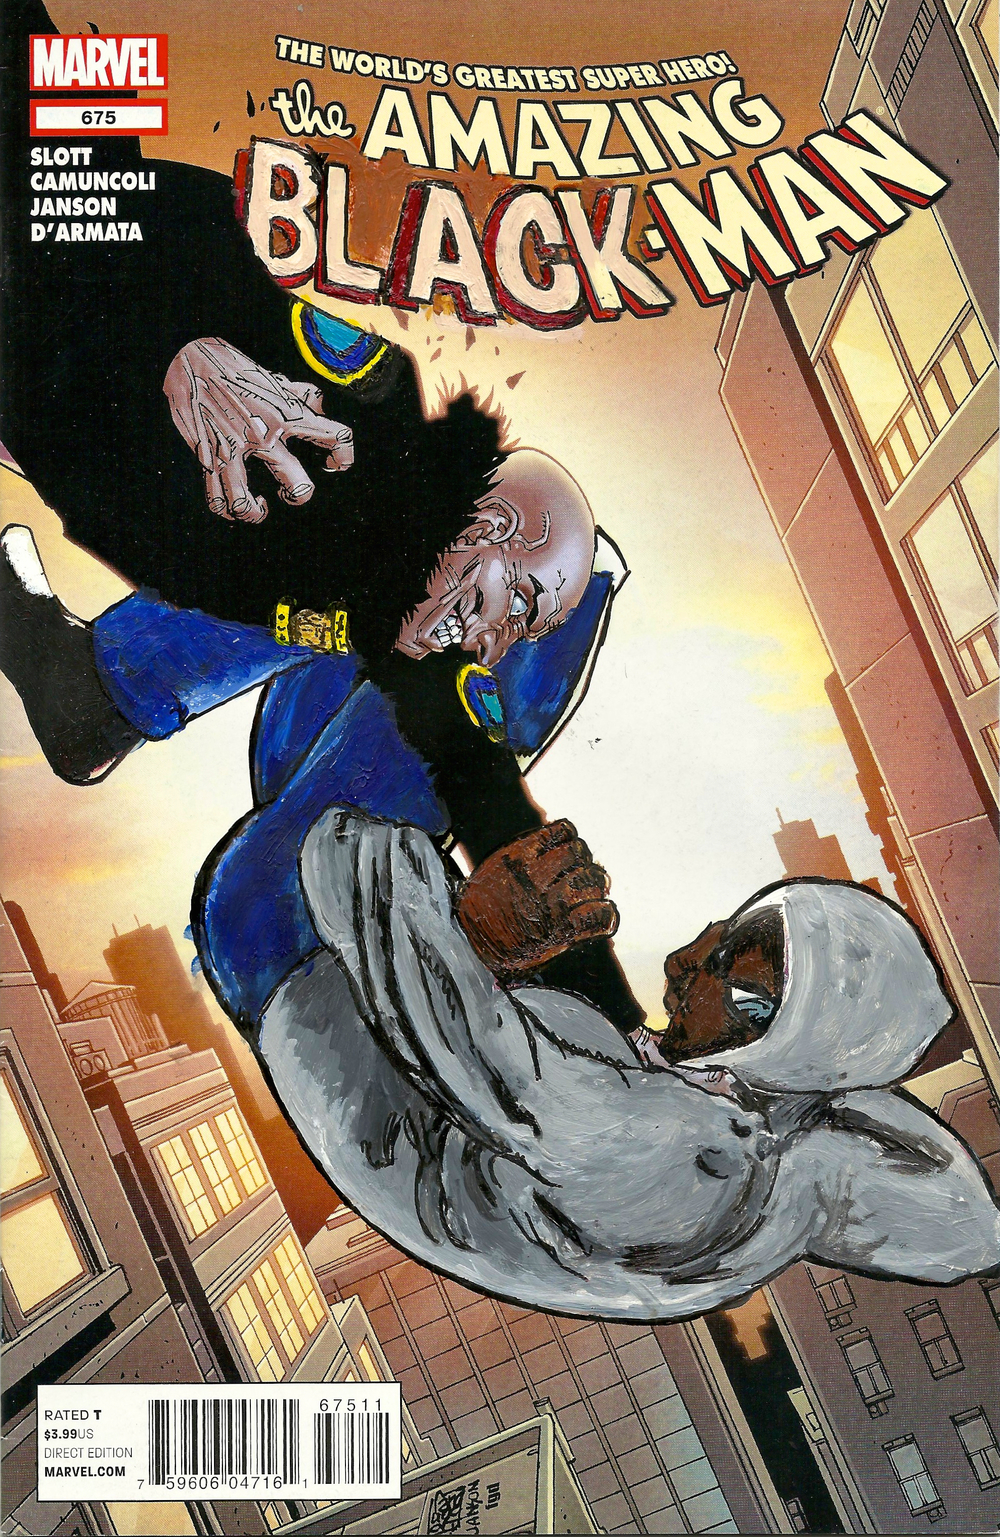 The Amazing Black-Man #675